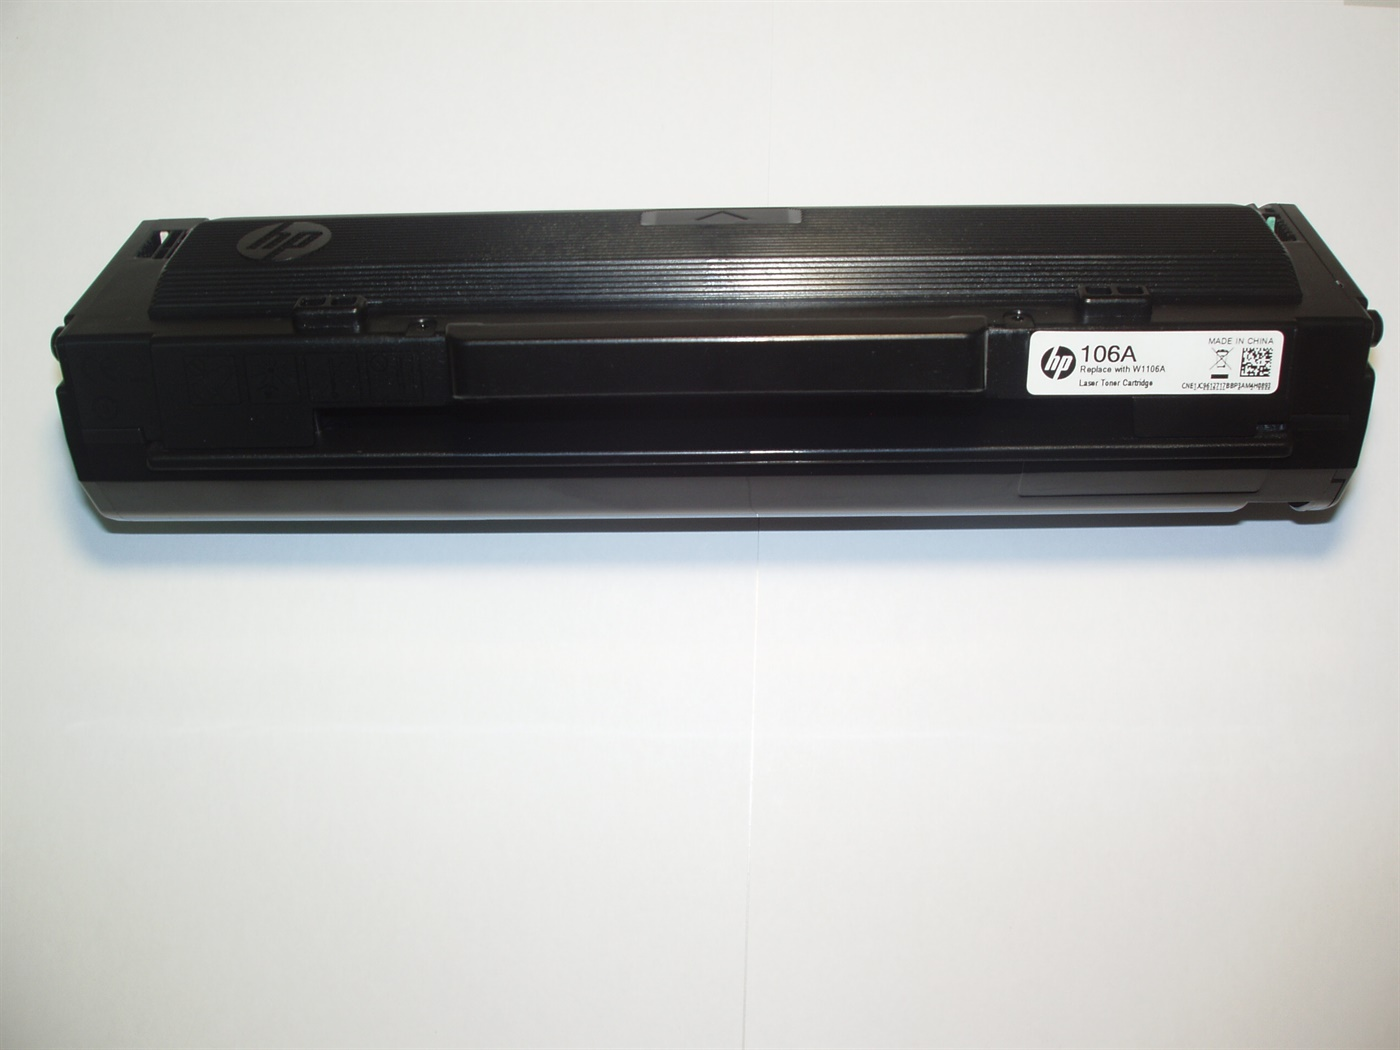 HP W1106A - s novim chipom